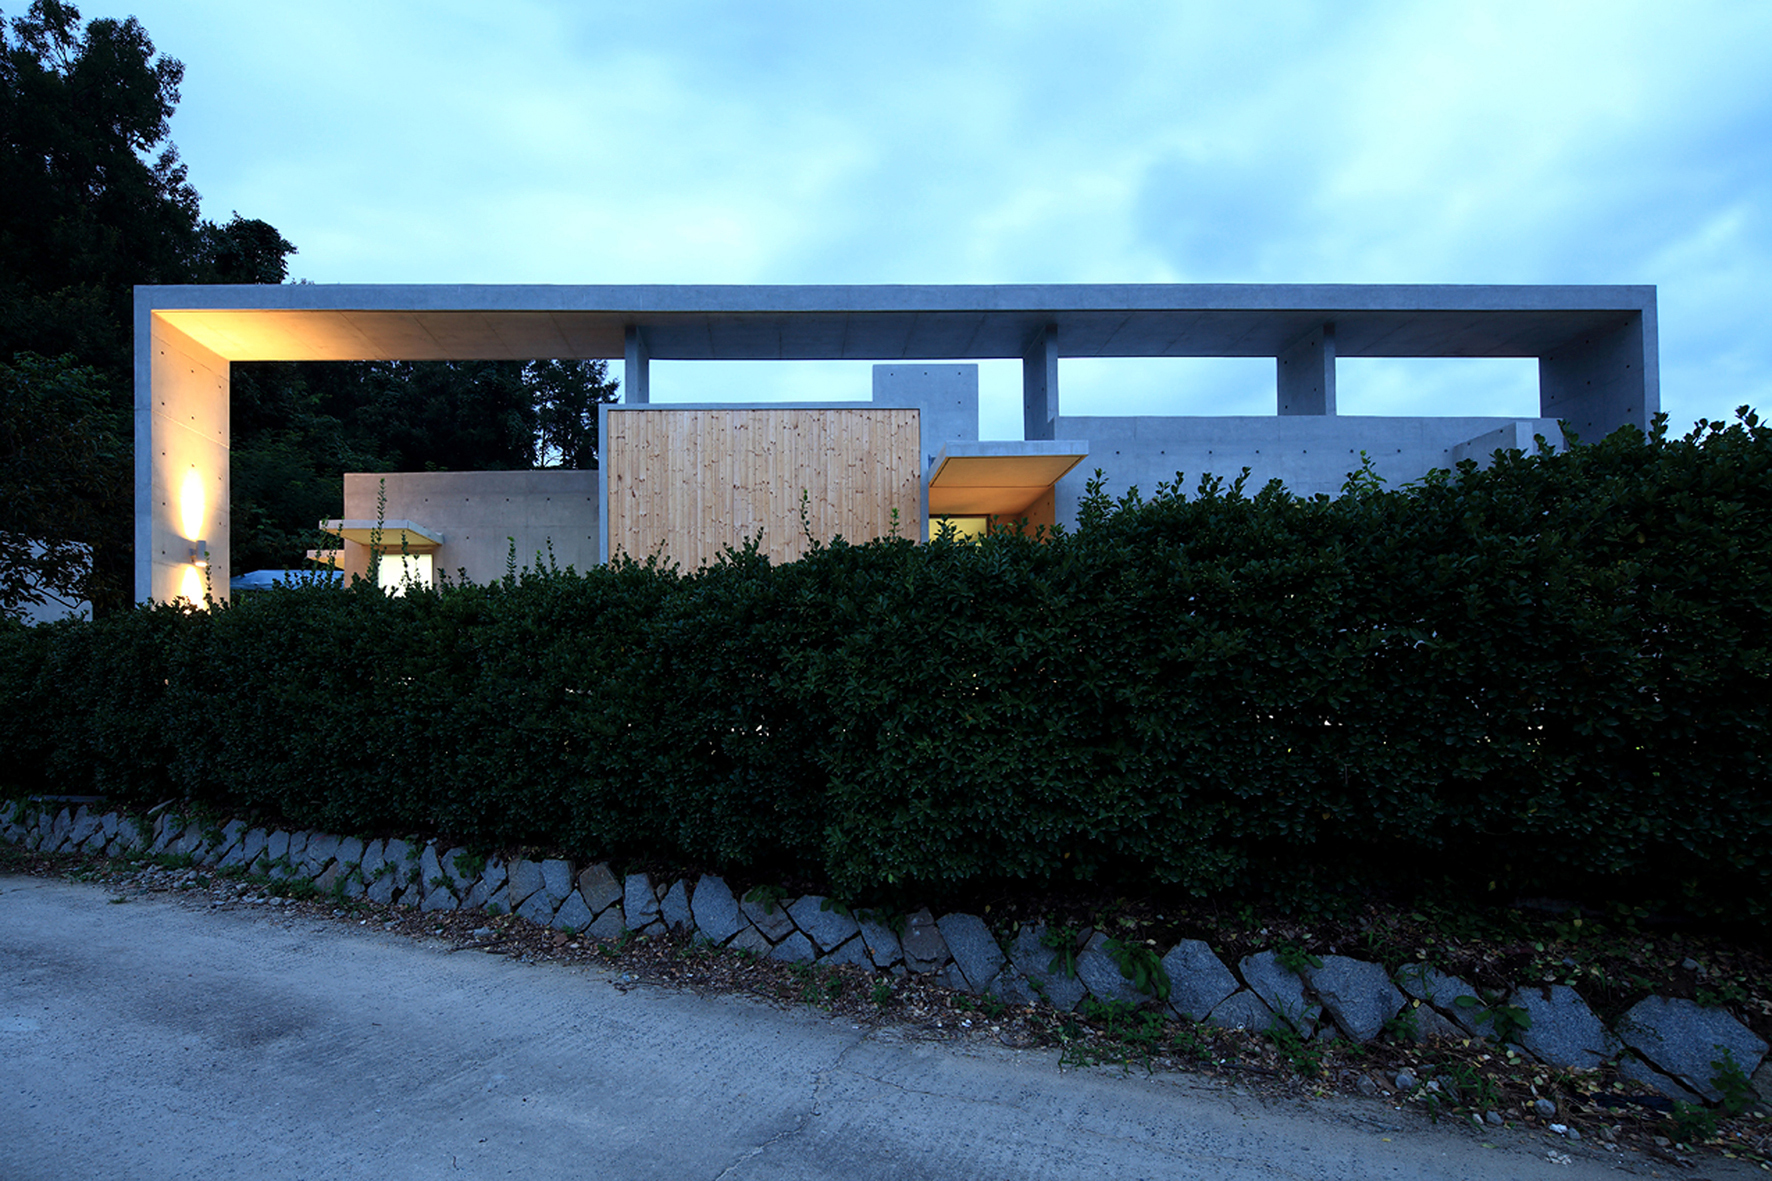 52f1a5dce8e44e61110000c1_mun-jeong-heon-a-m-architects_a5